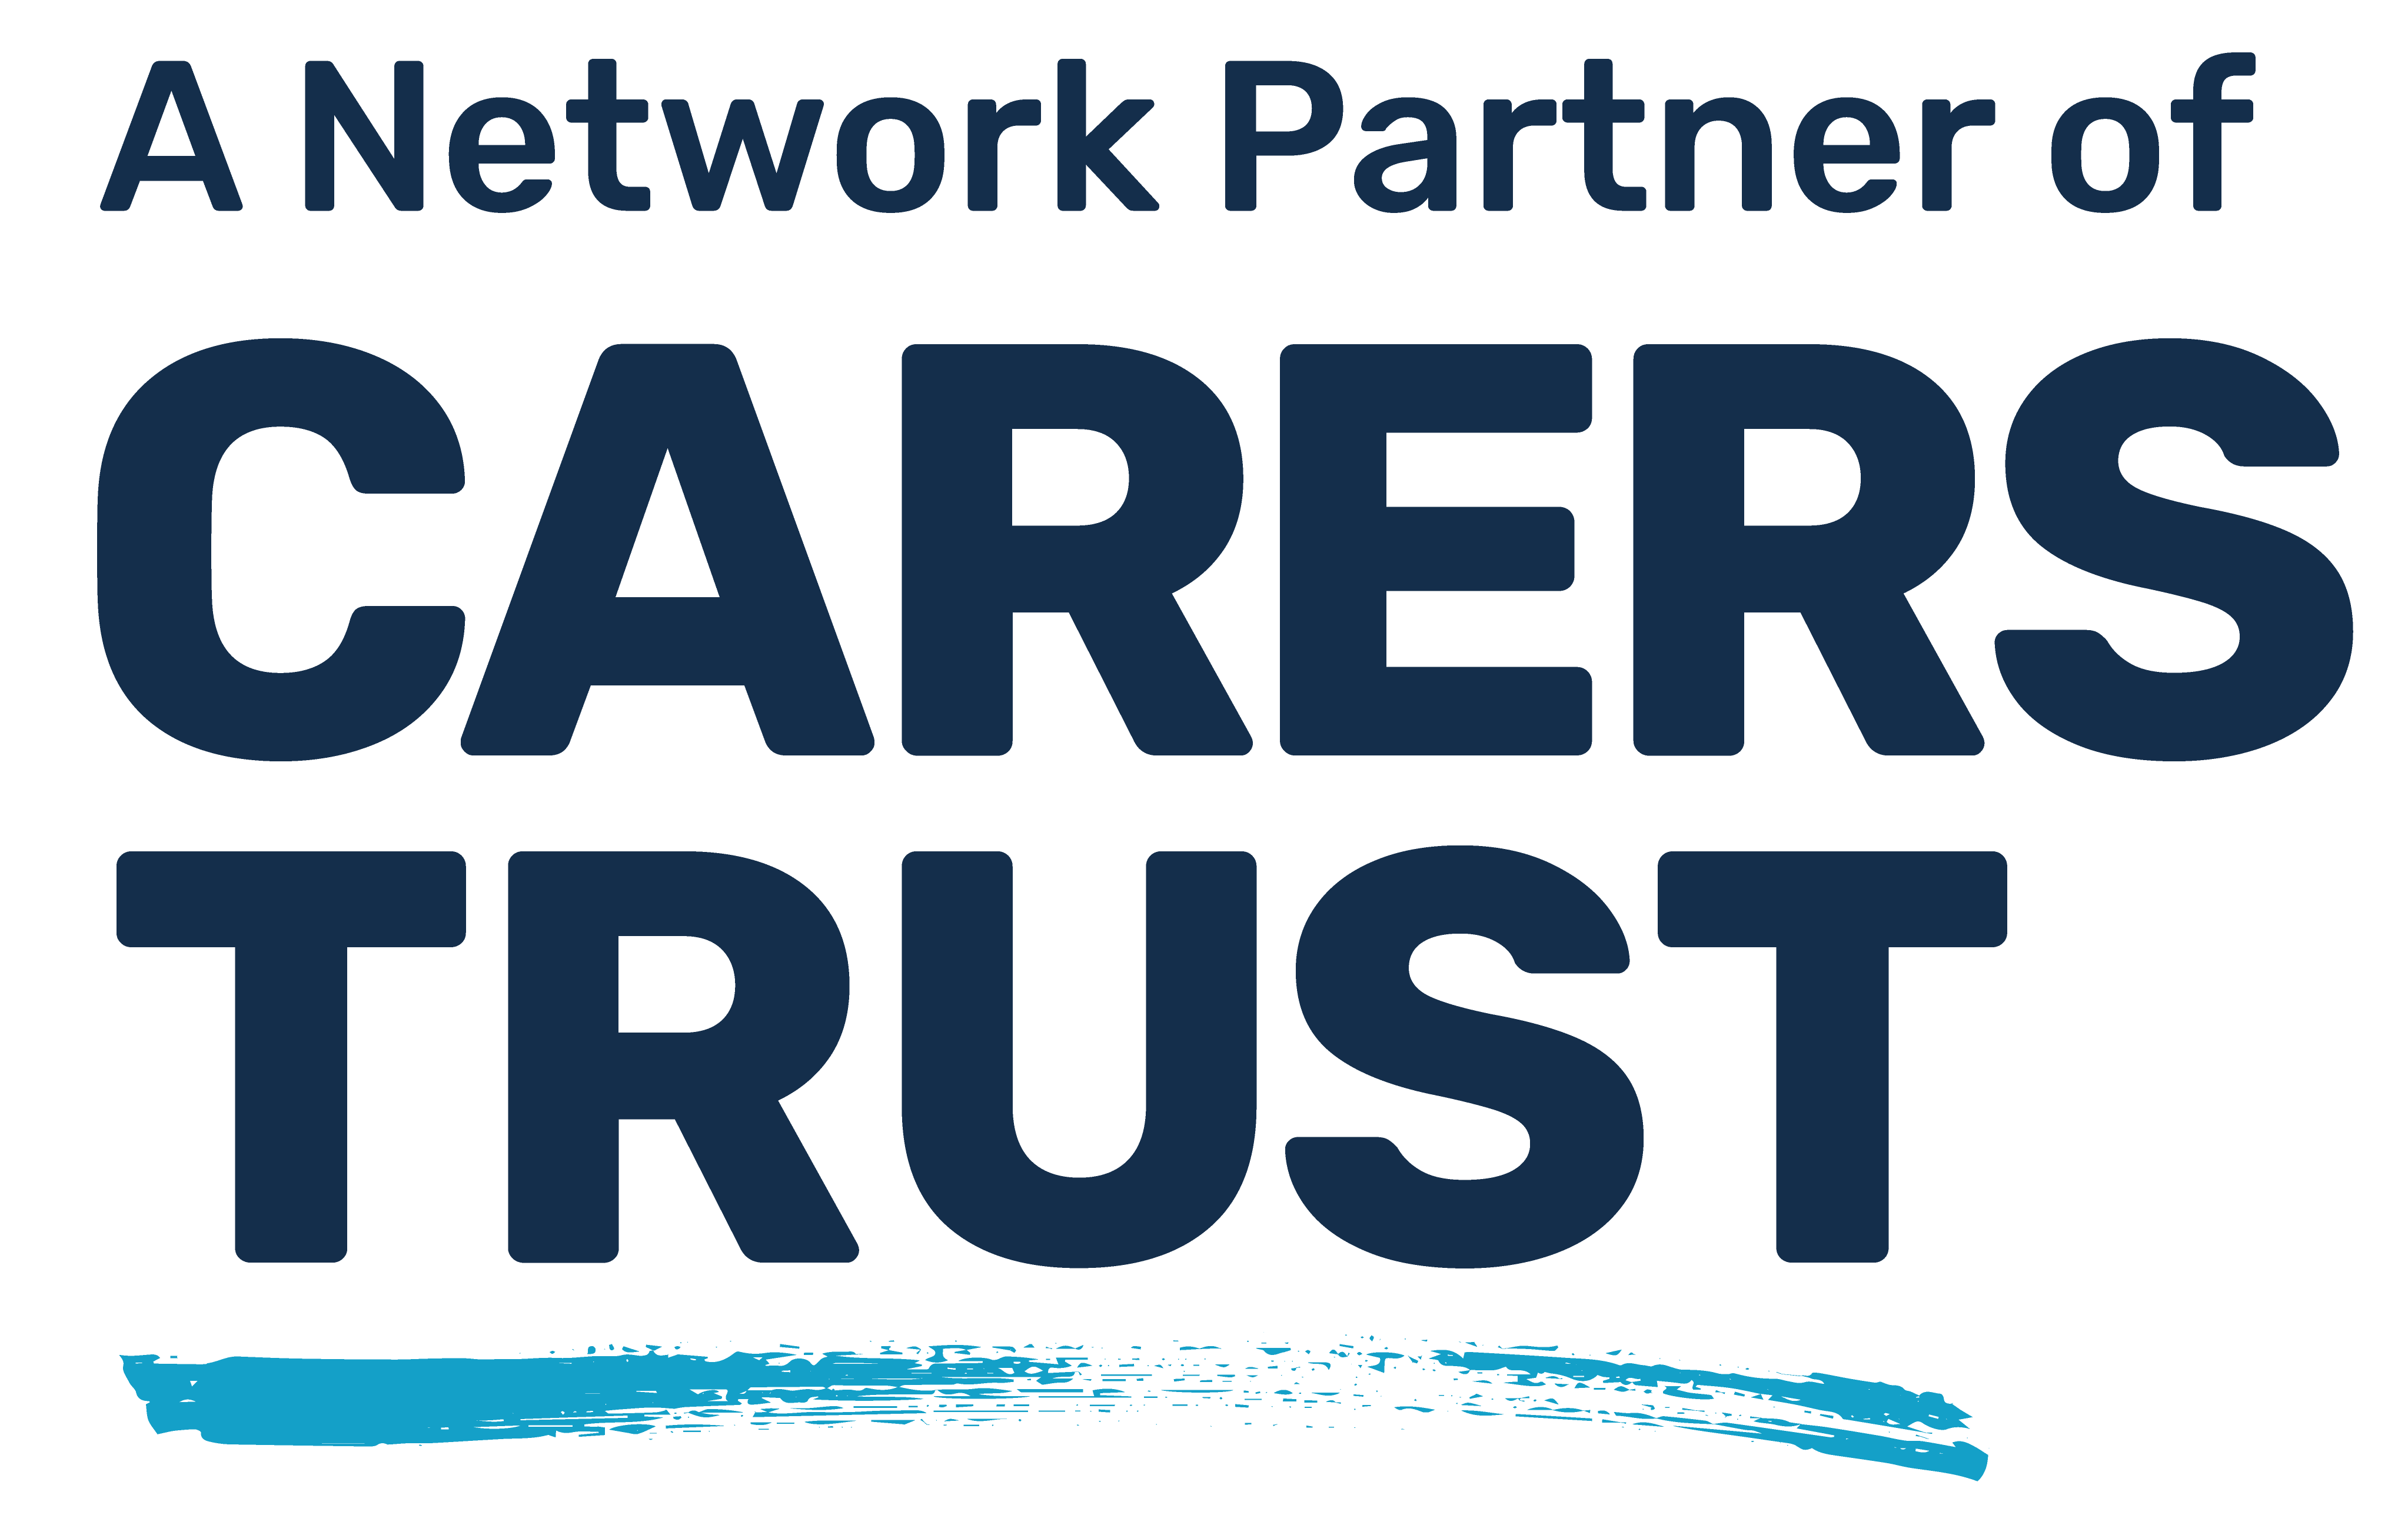 Carers Trust Network Partner